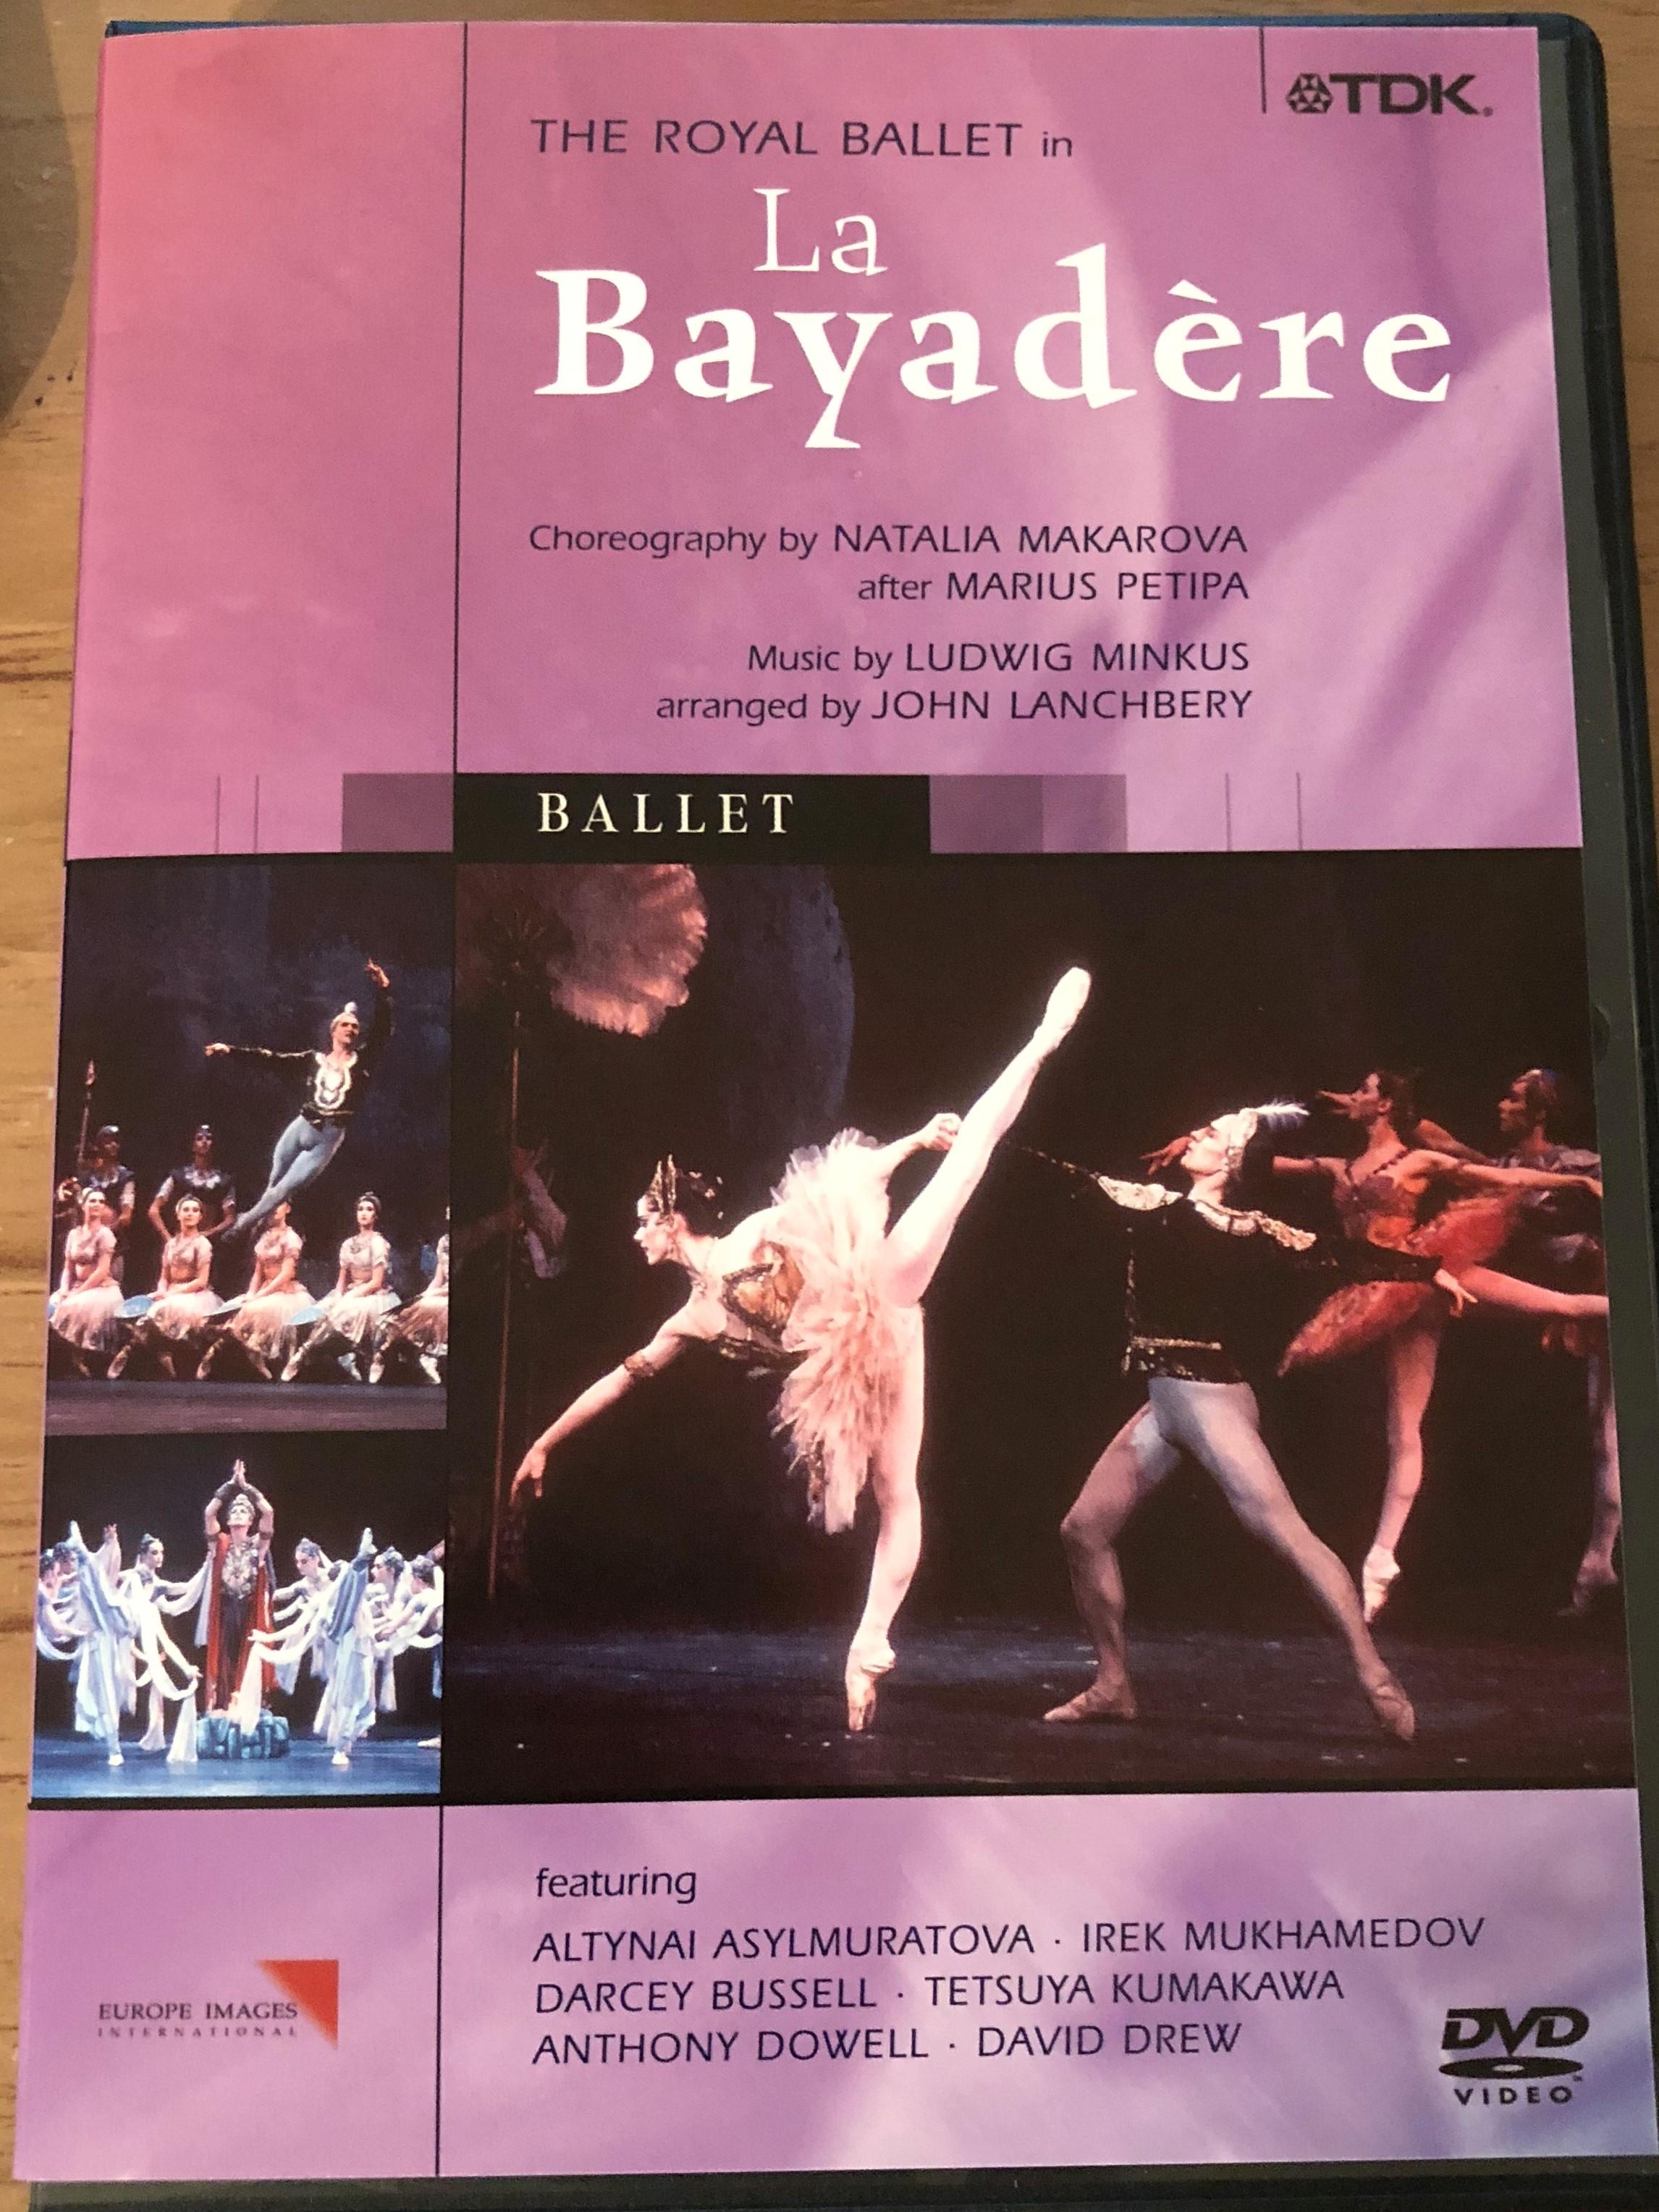 the-royal-ballet-in-la-bayadere-dvd-music-by-ludwig-minkus-choreography-by-natalia-makarova-altynai-asylmuratova-irek-mukhamedov-darcey-bussell-tetsuya-kumakawa-anthony-dowell-david-drew-royal-opera-house-orchestra-co-1-.jpg